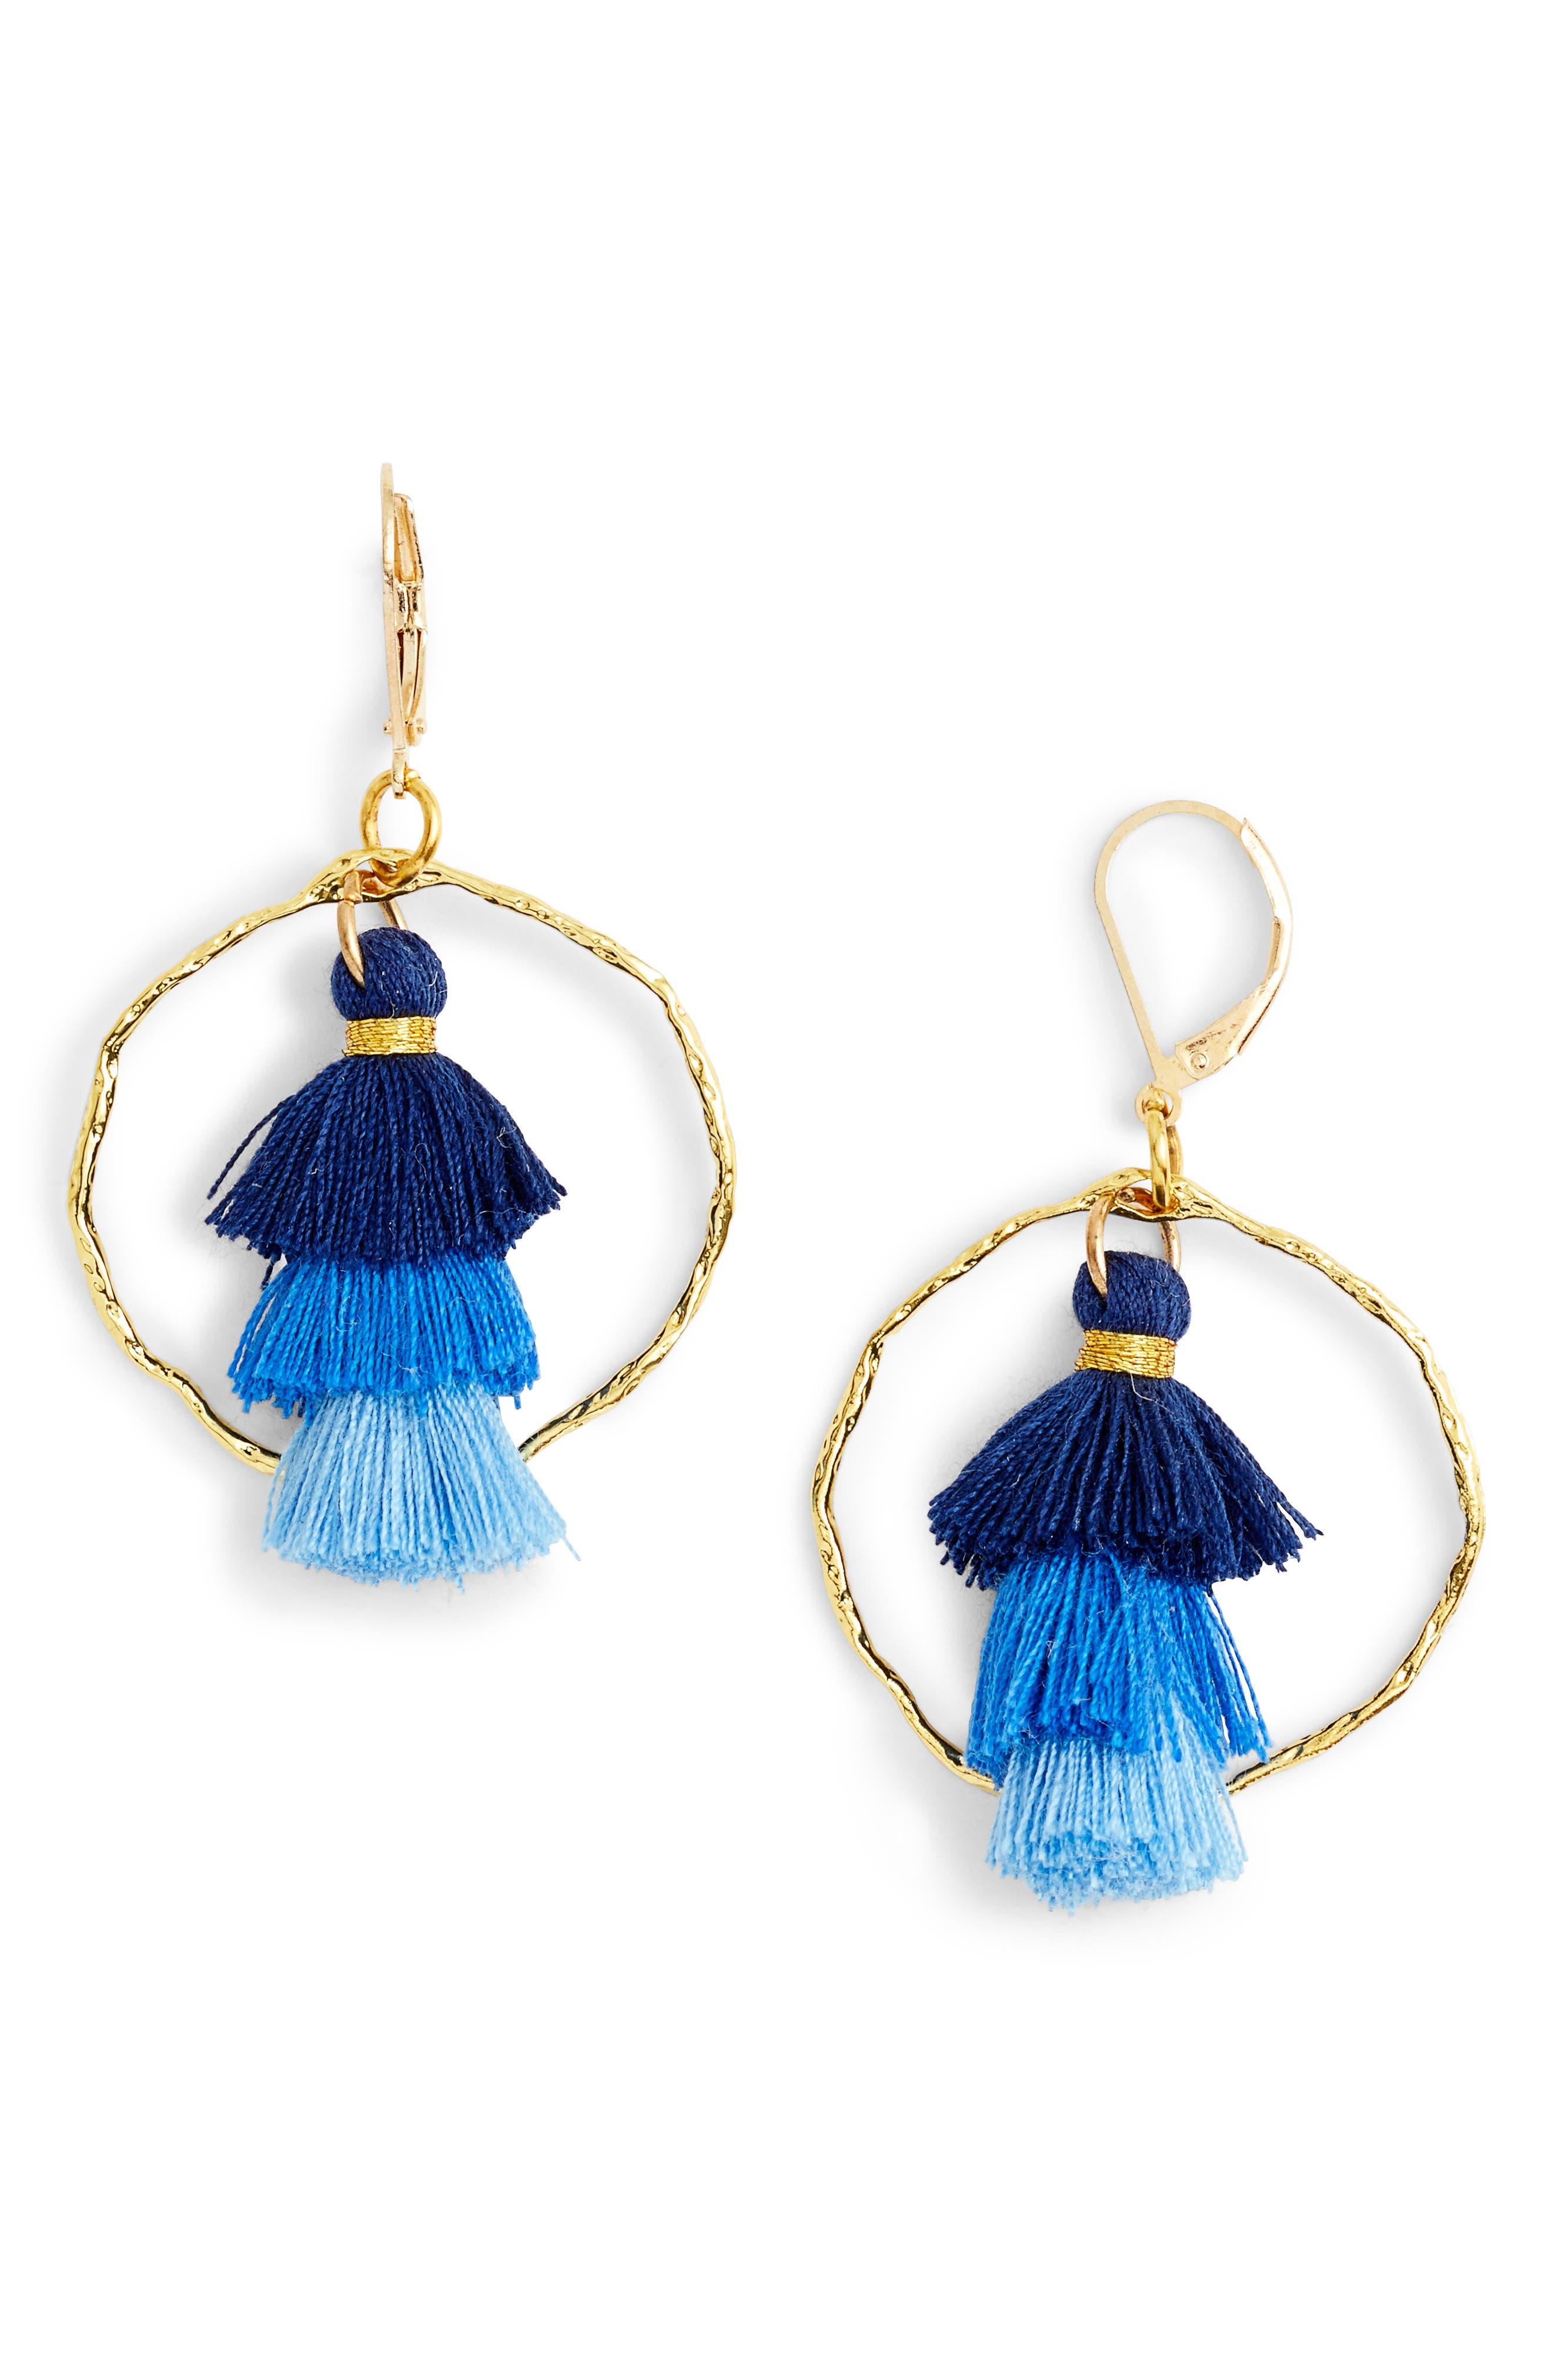 Mad Jewels Ibiza Tassel & Hammered Hoop Earrings